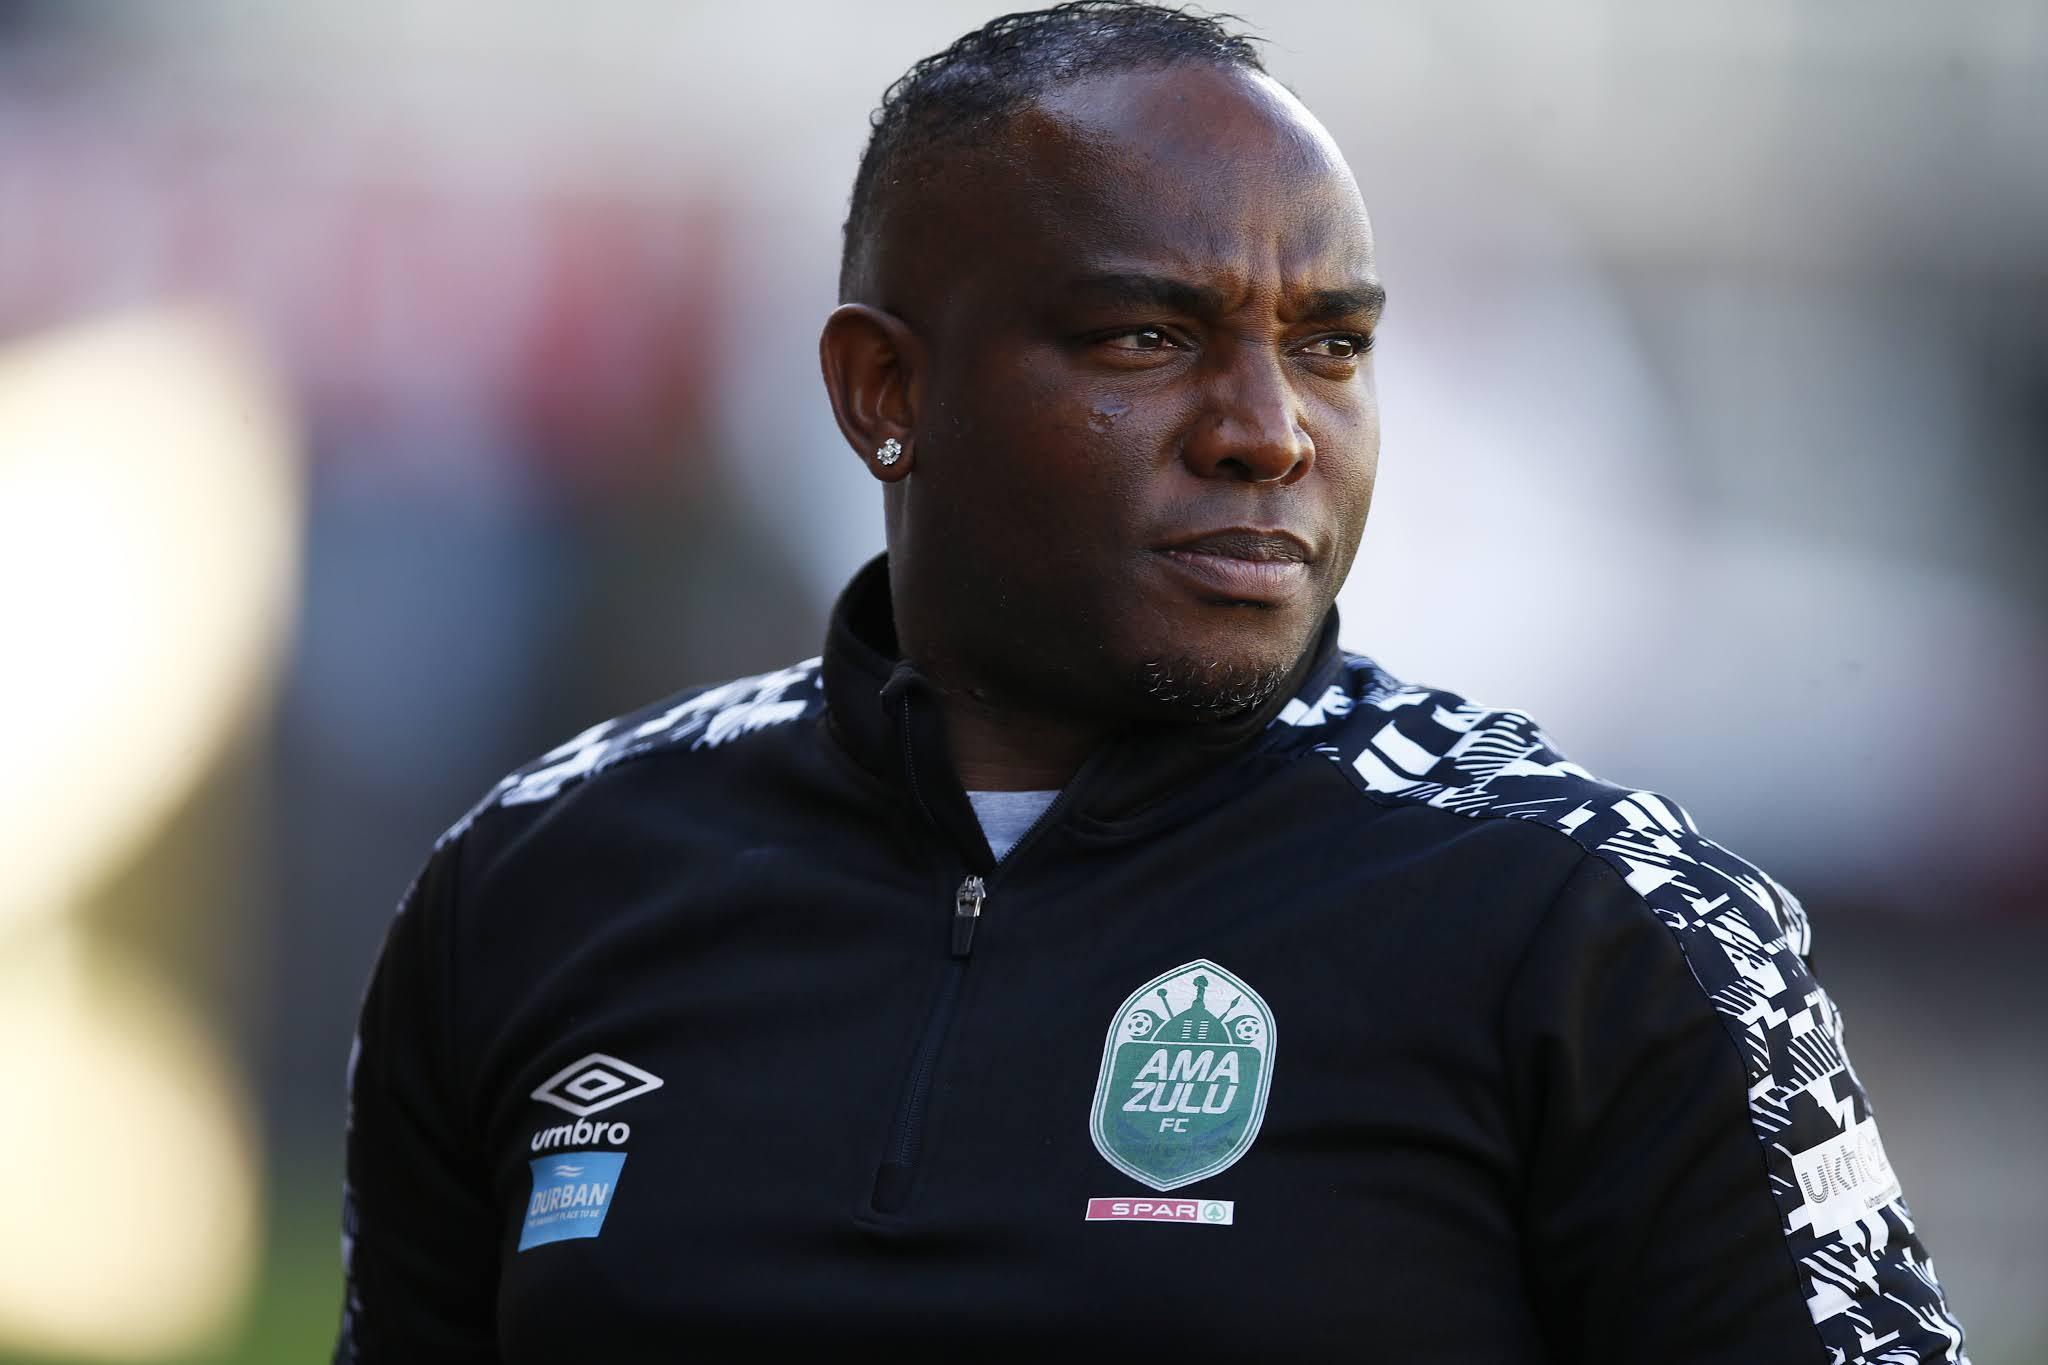 Coach Benni McCarthy has been a major influence along with Mandla Ncikazi at Golden Arrows, inspiring KZN footballers to display their talent